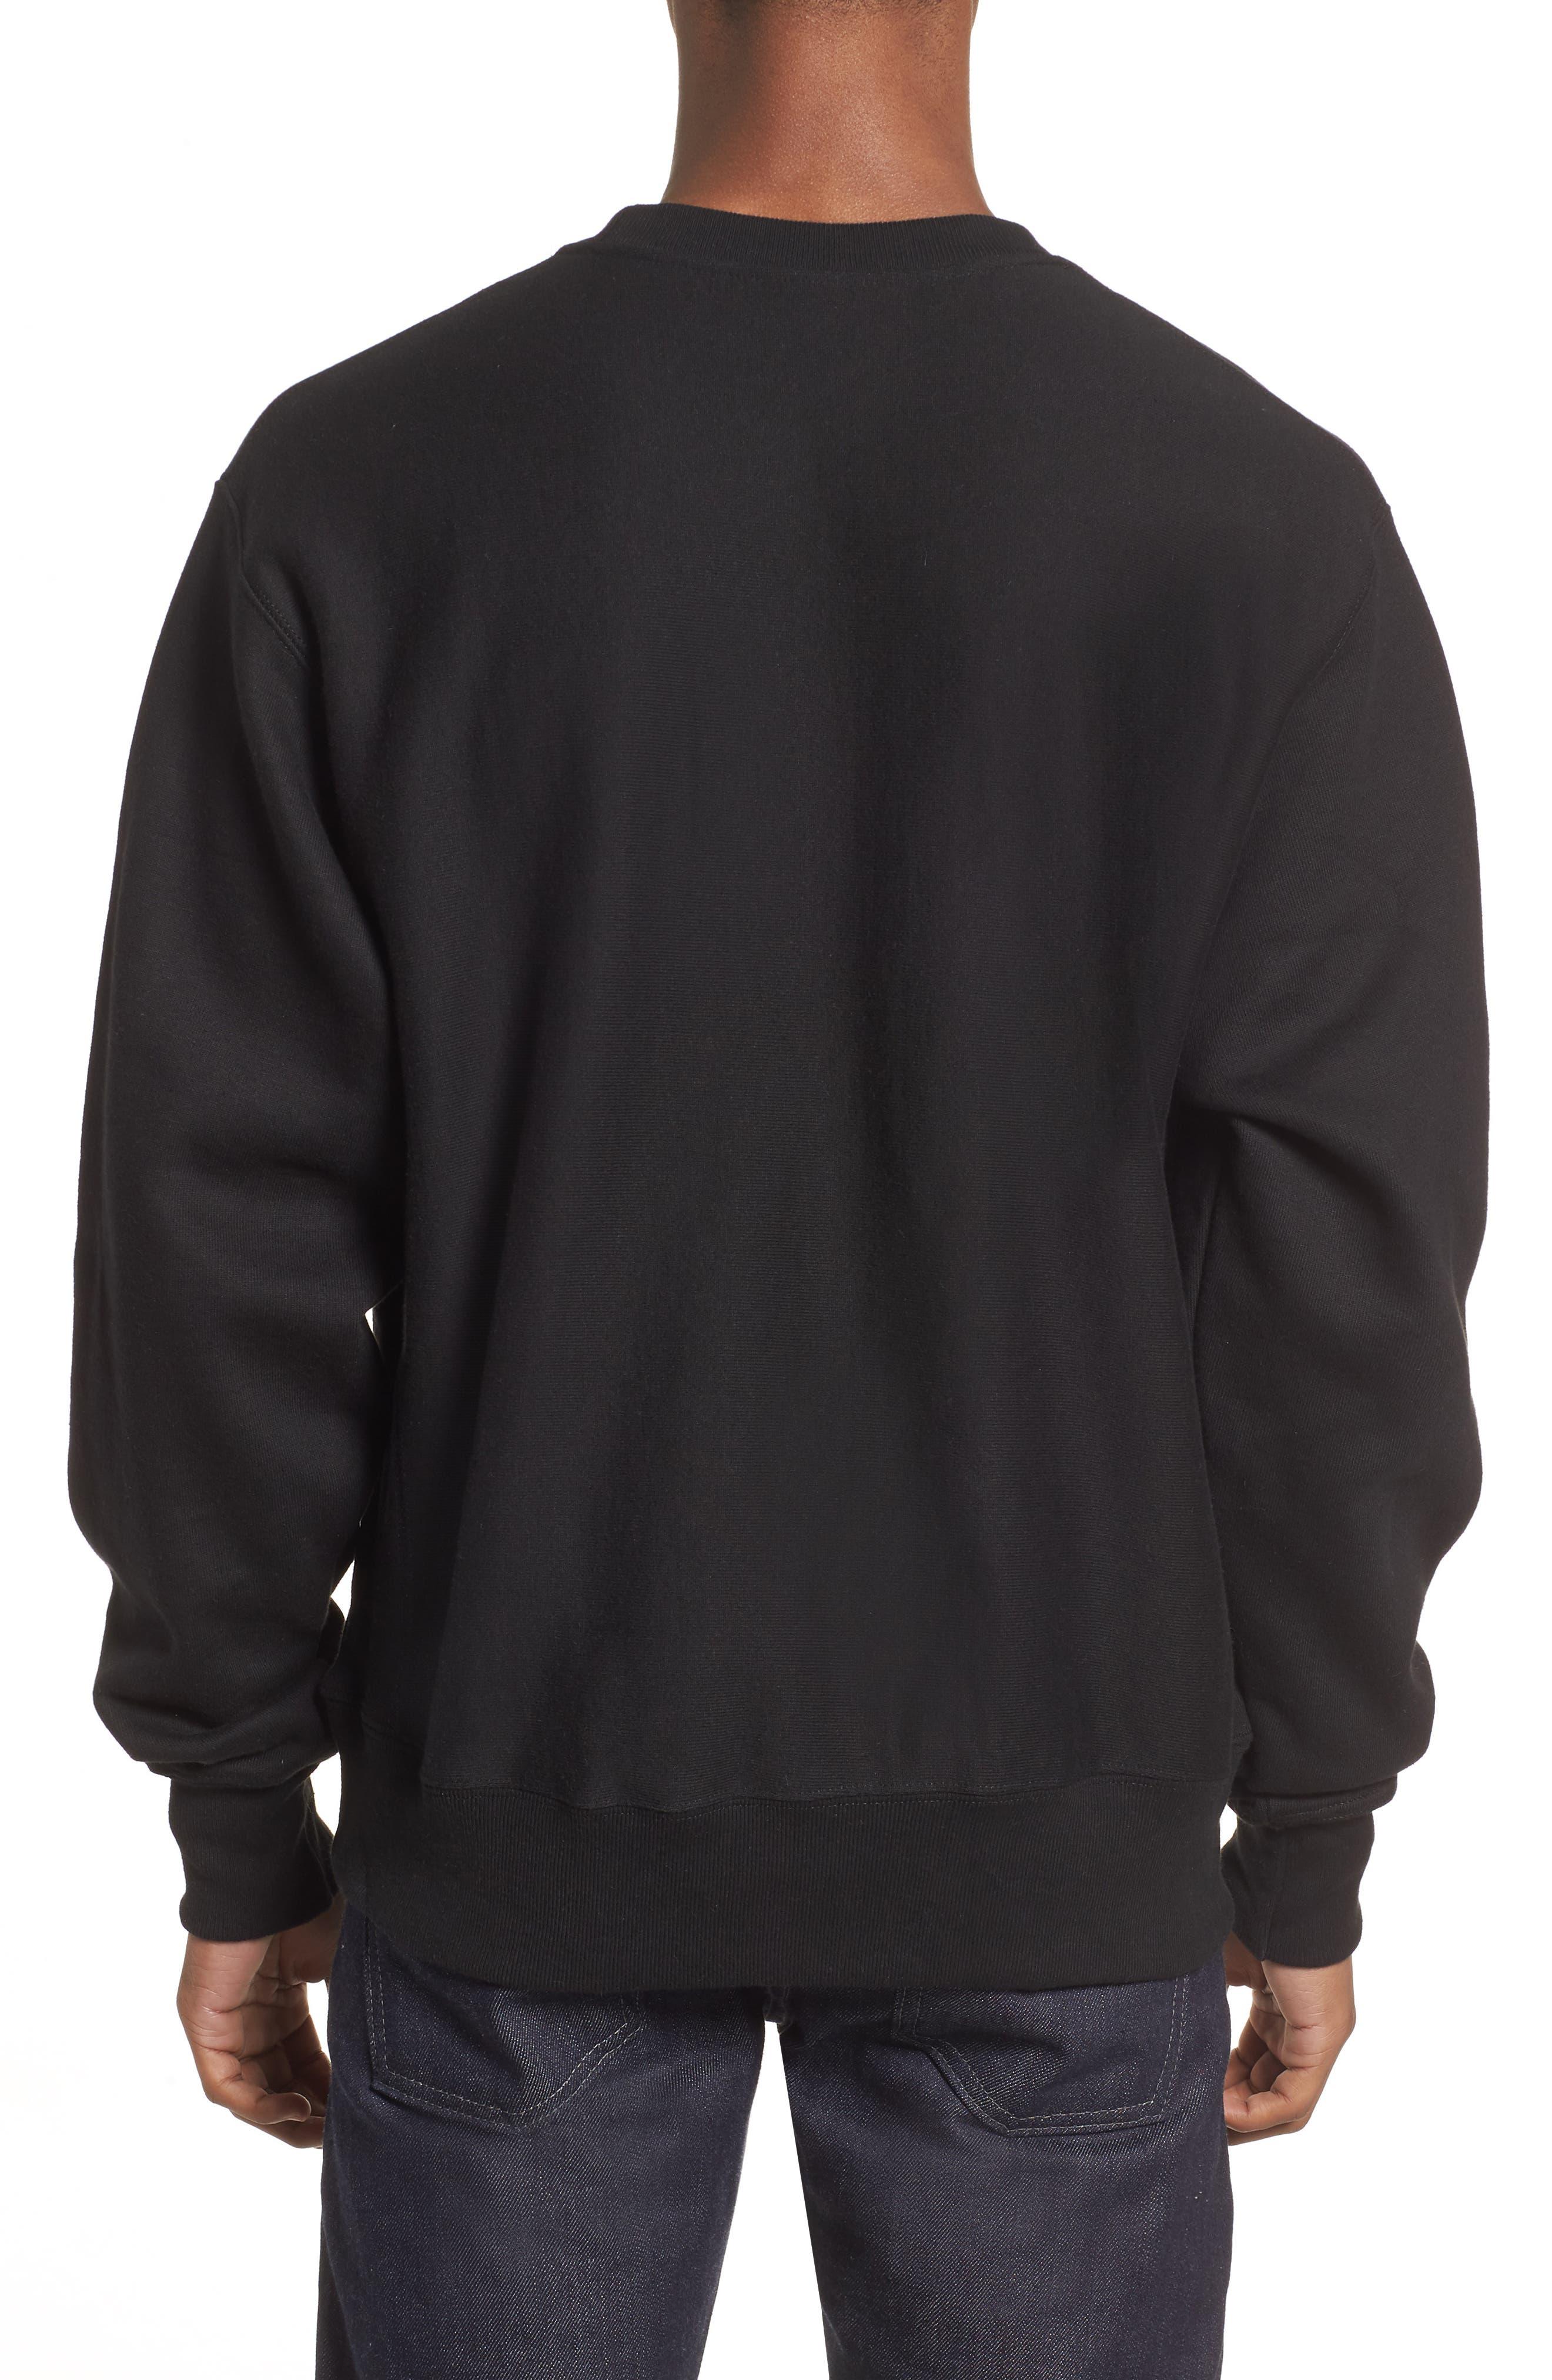 Snoopy Unisex Sweatshirt,                             Alternate thumbnail 2, color,                             001